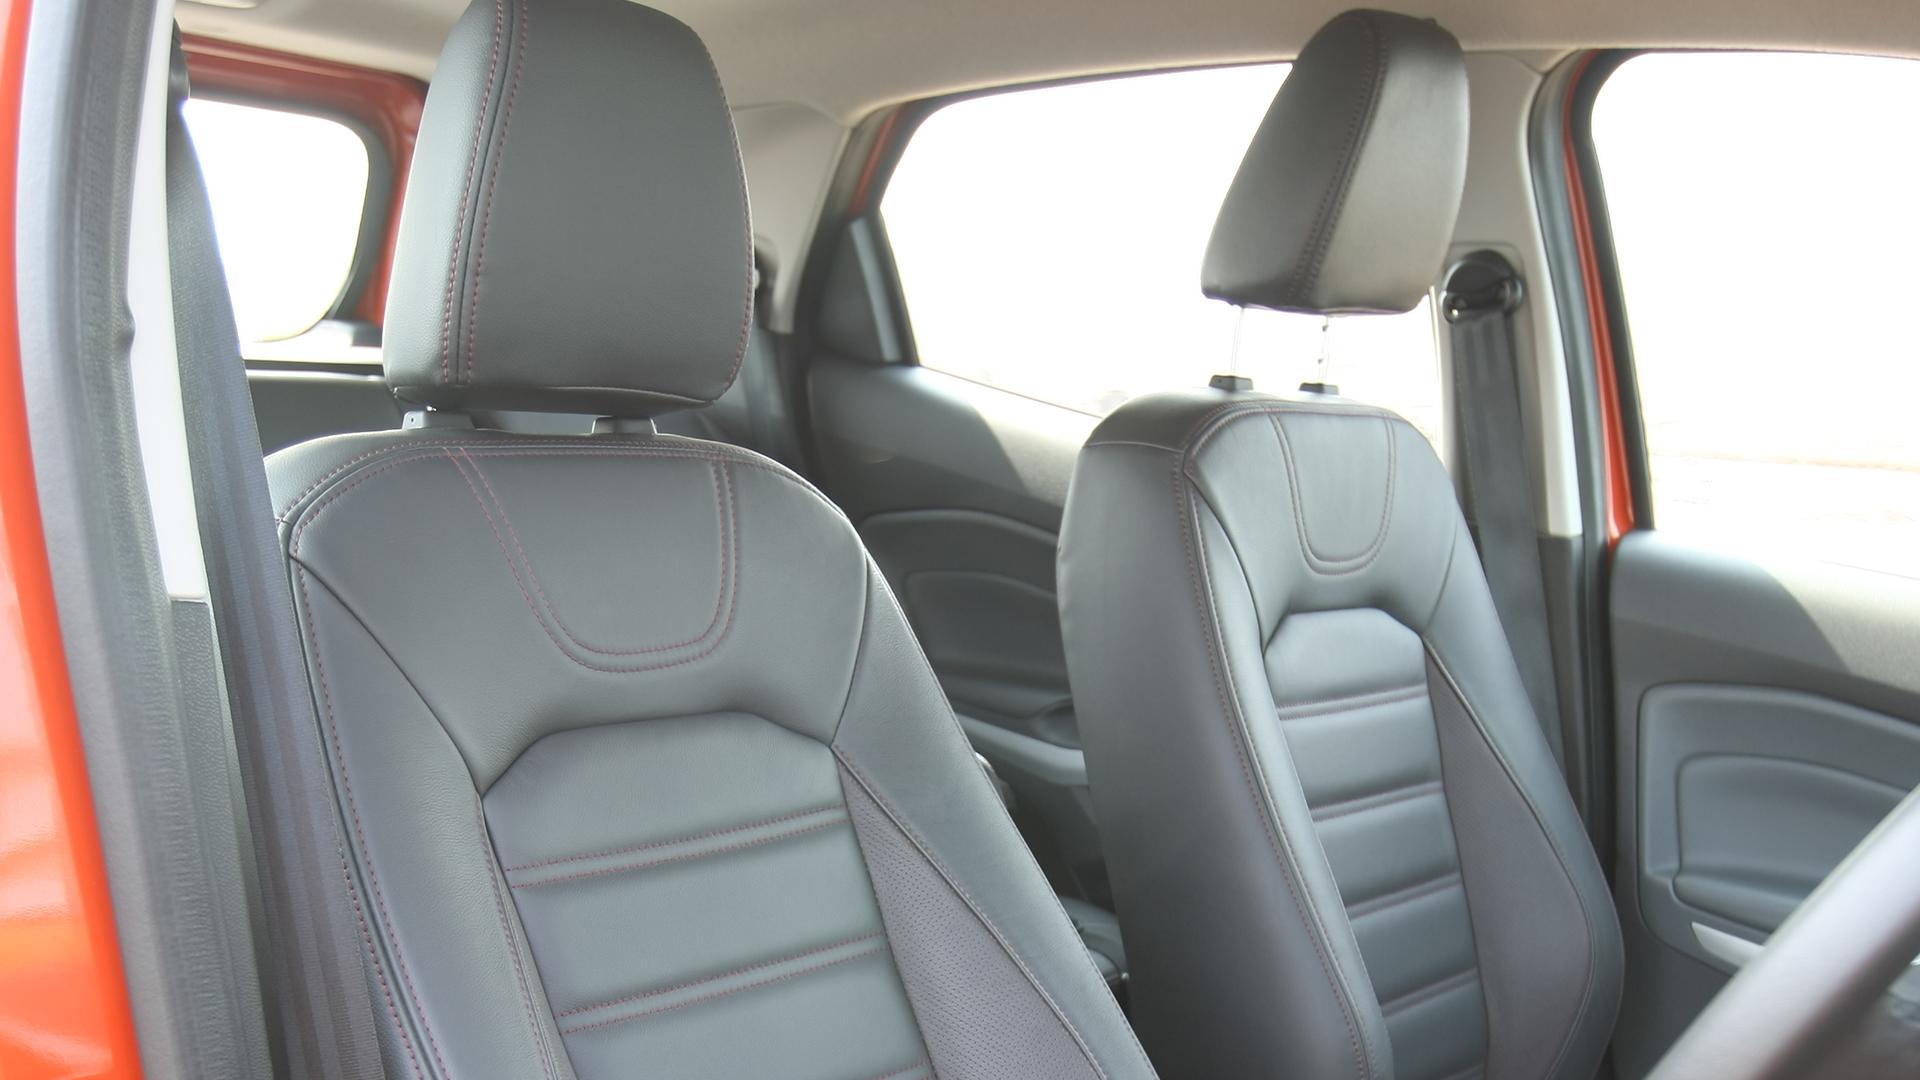 Ford-Ecosport-2013-Petrol-Interior